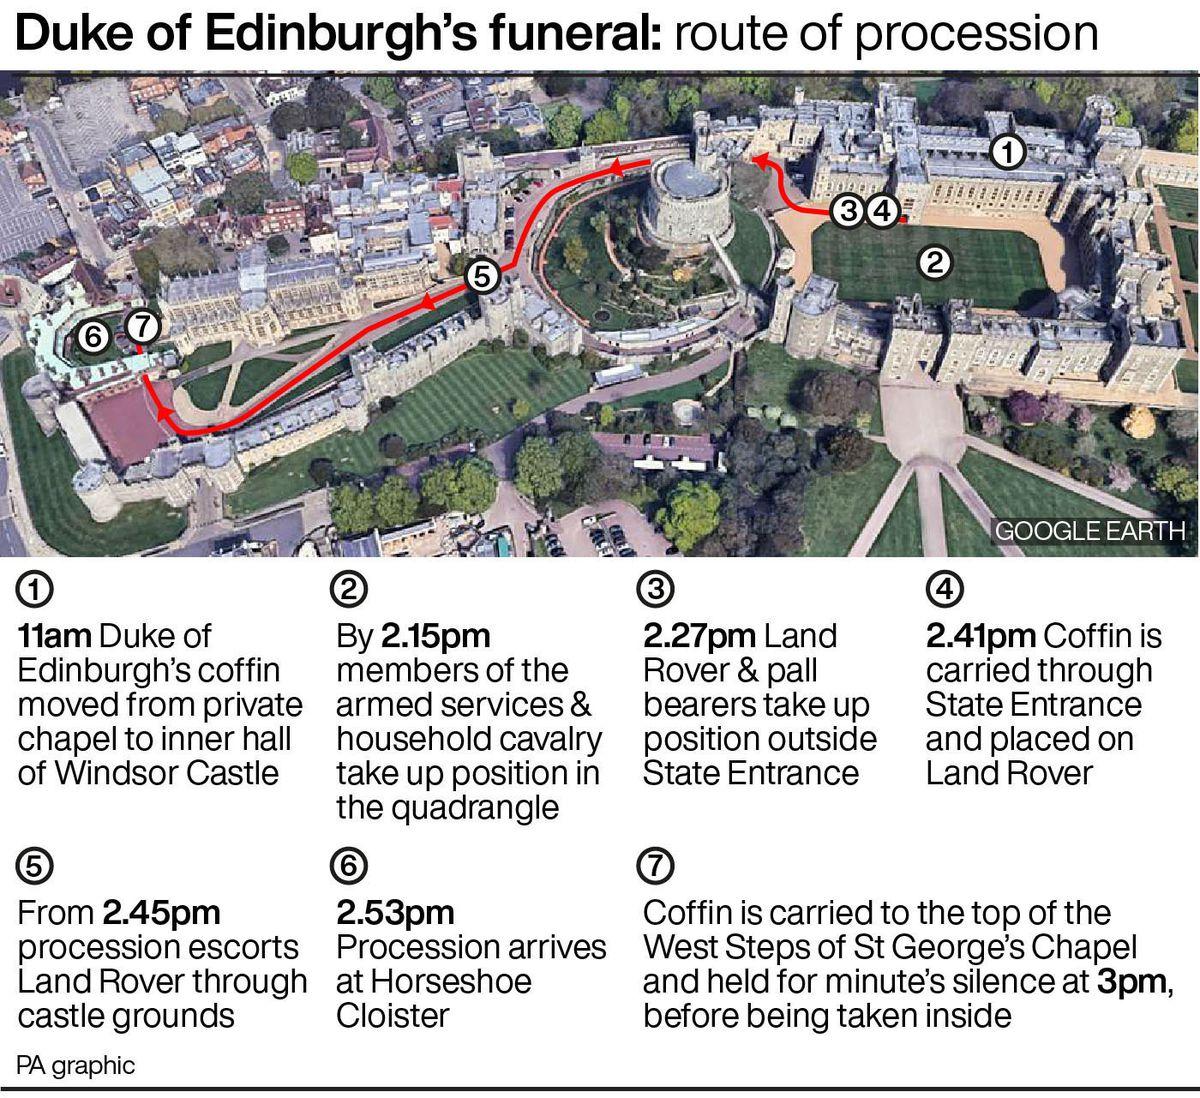 The Duke of Edinburgh's funeral procession route